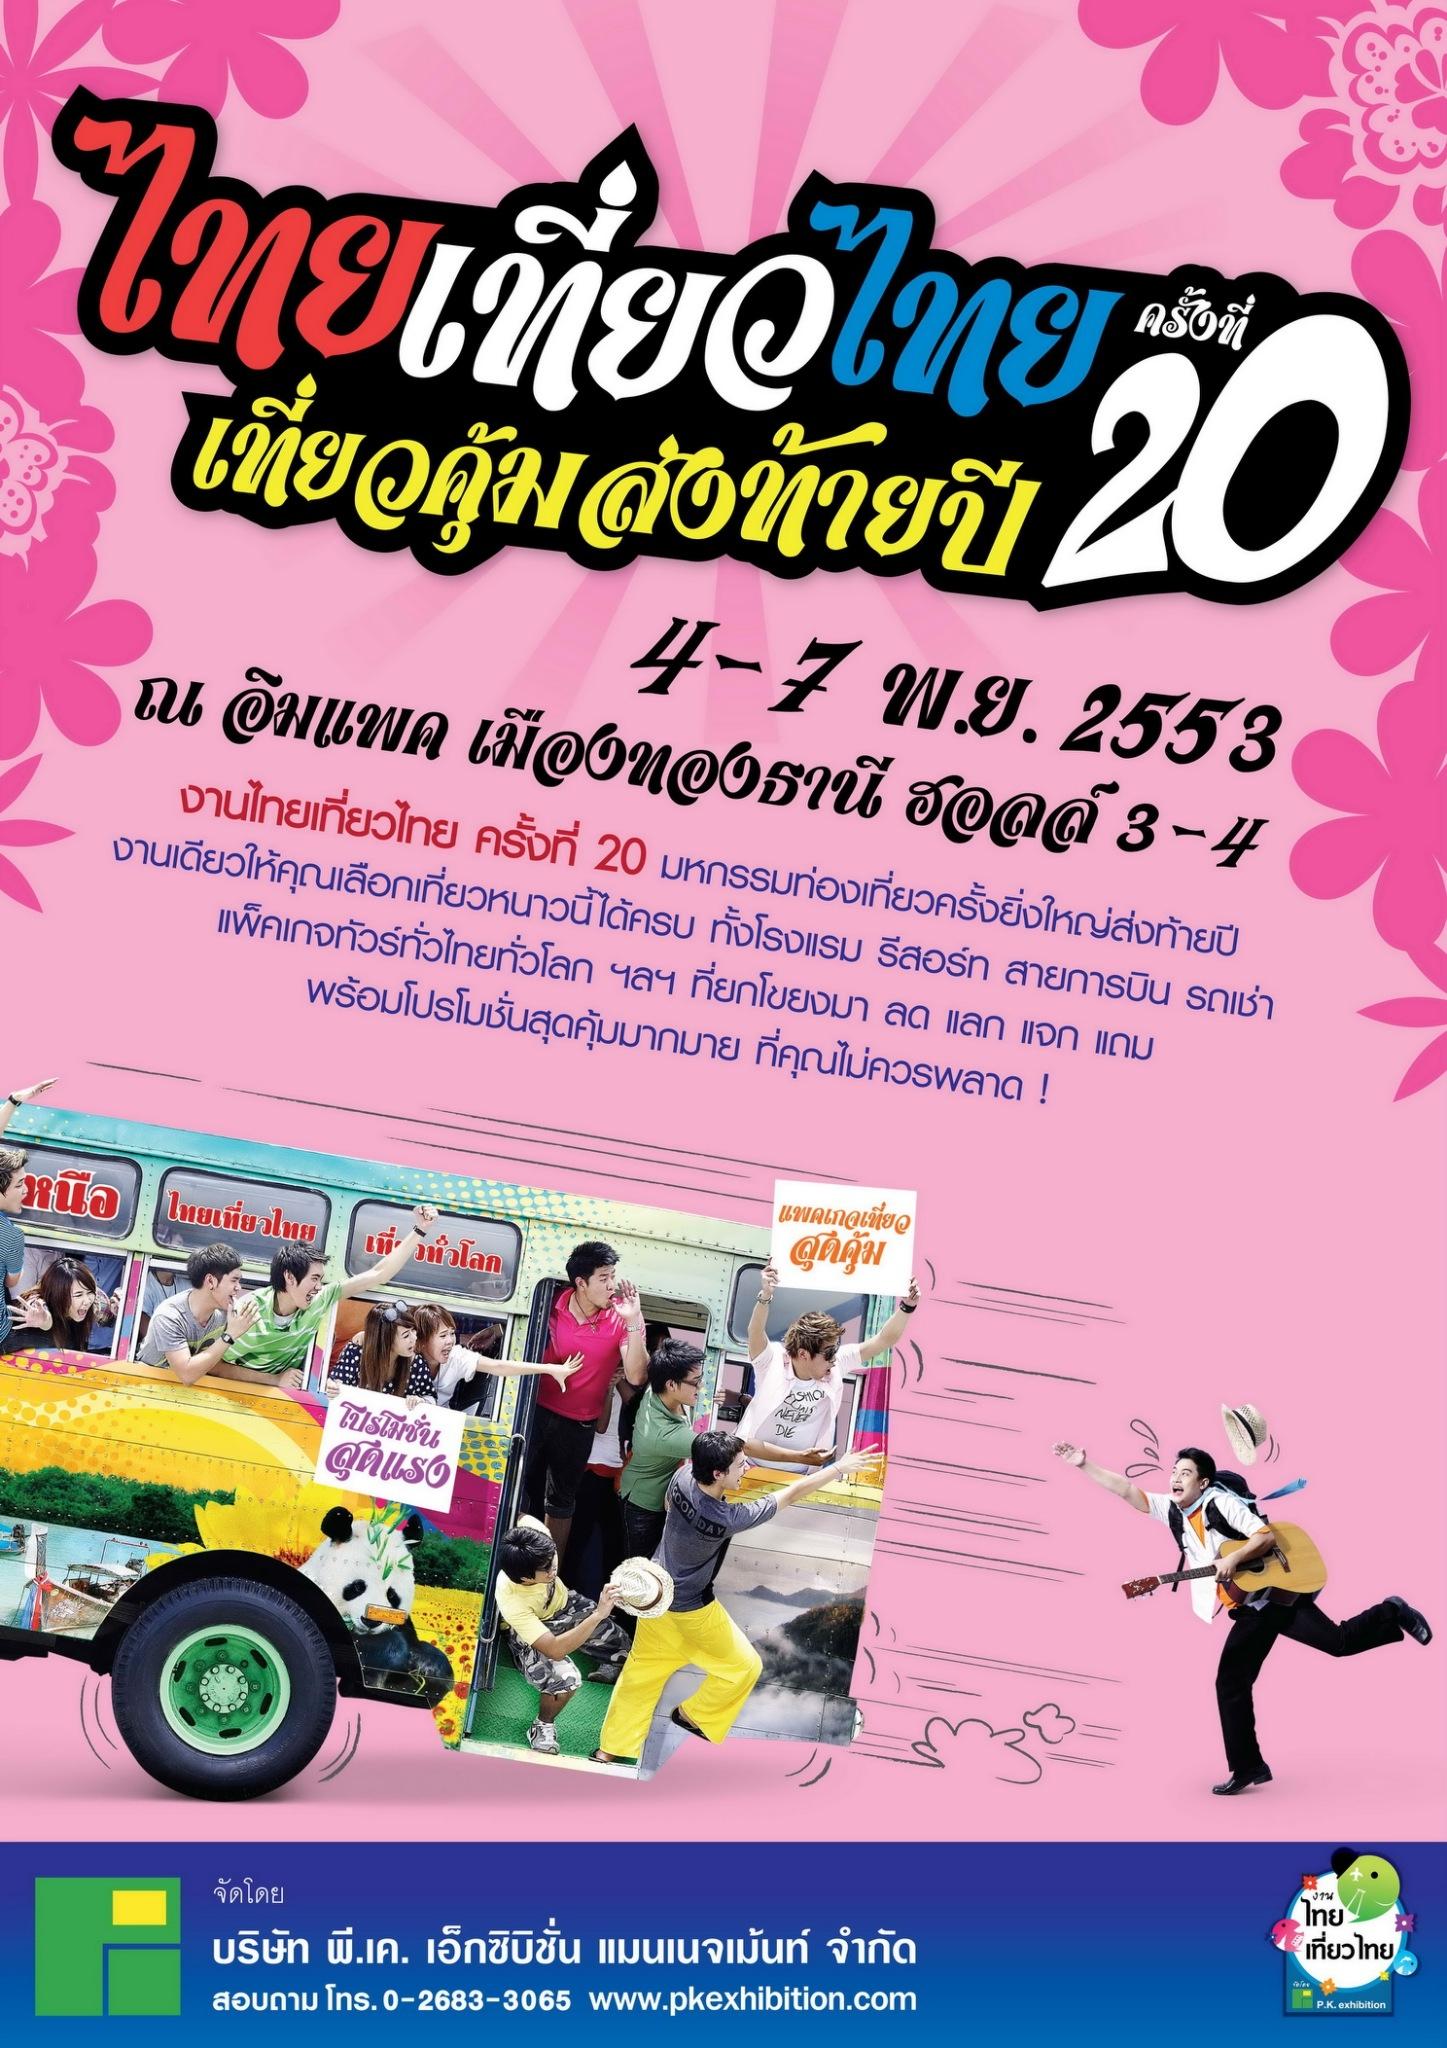 Ad งานไทยเที่ยวไทย_๒๐๐๕๒๕_0035